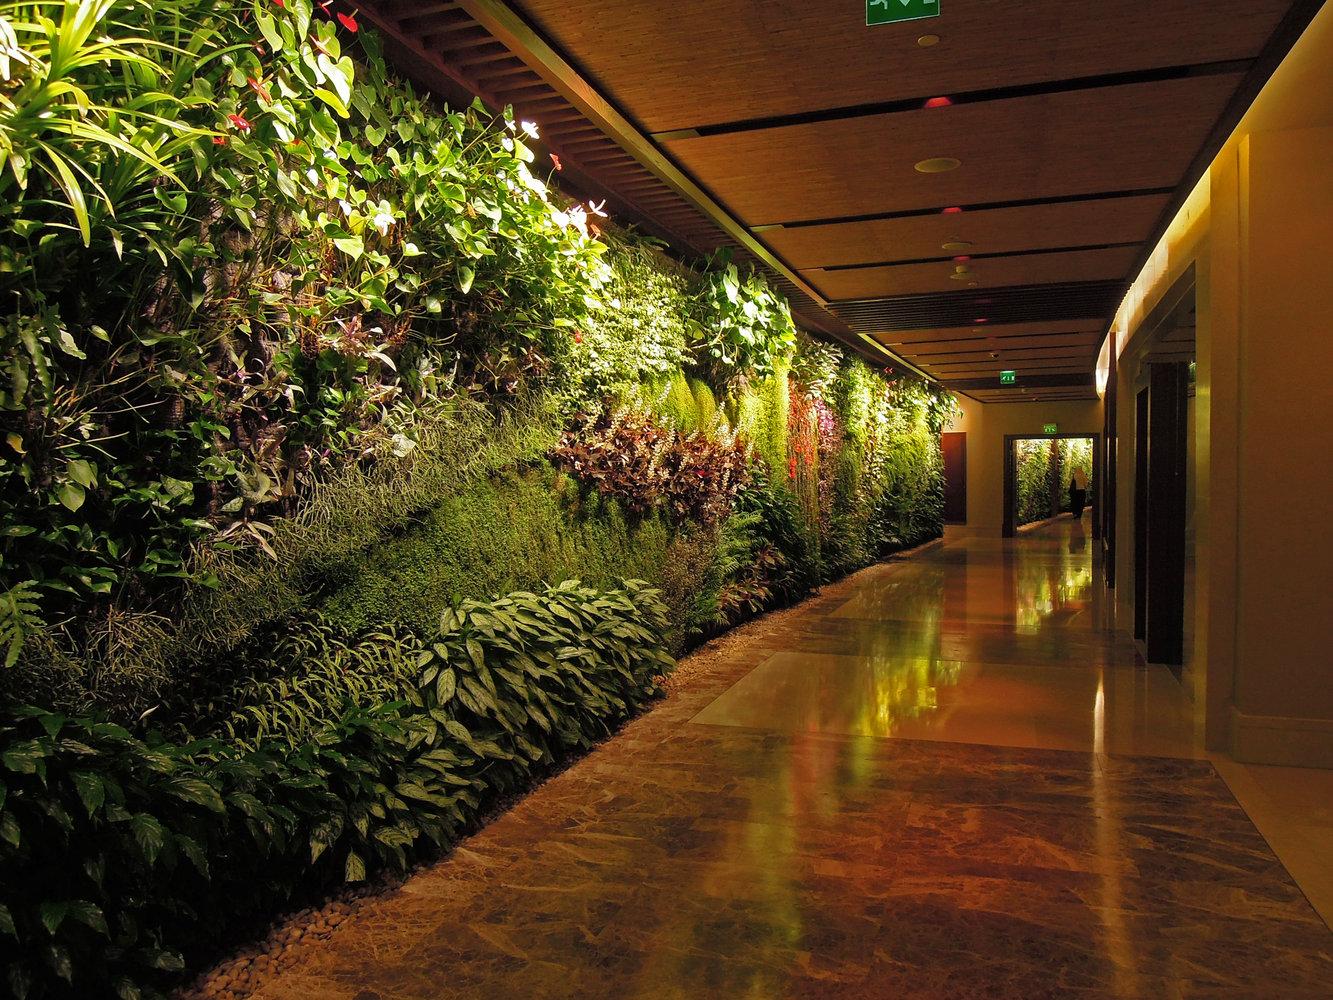 Sofitel palm jumeirah dubai vertical garden patrick blanc colorful living waves in the corridor sofitel palm jumeirah dubai sciox Image collections